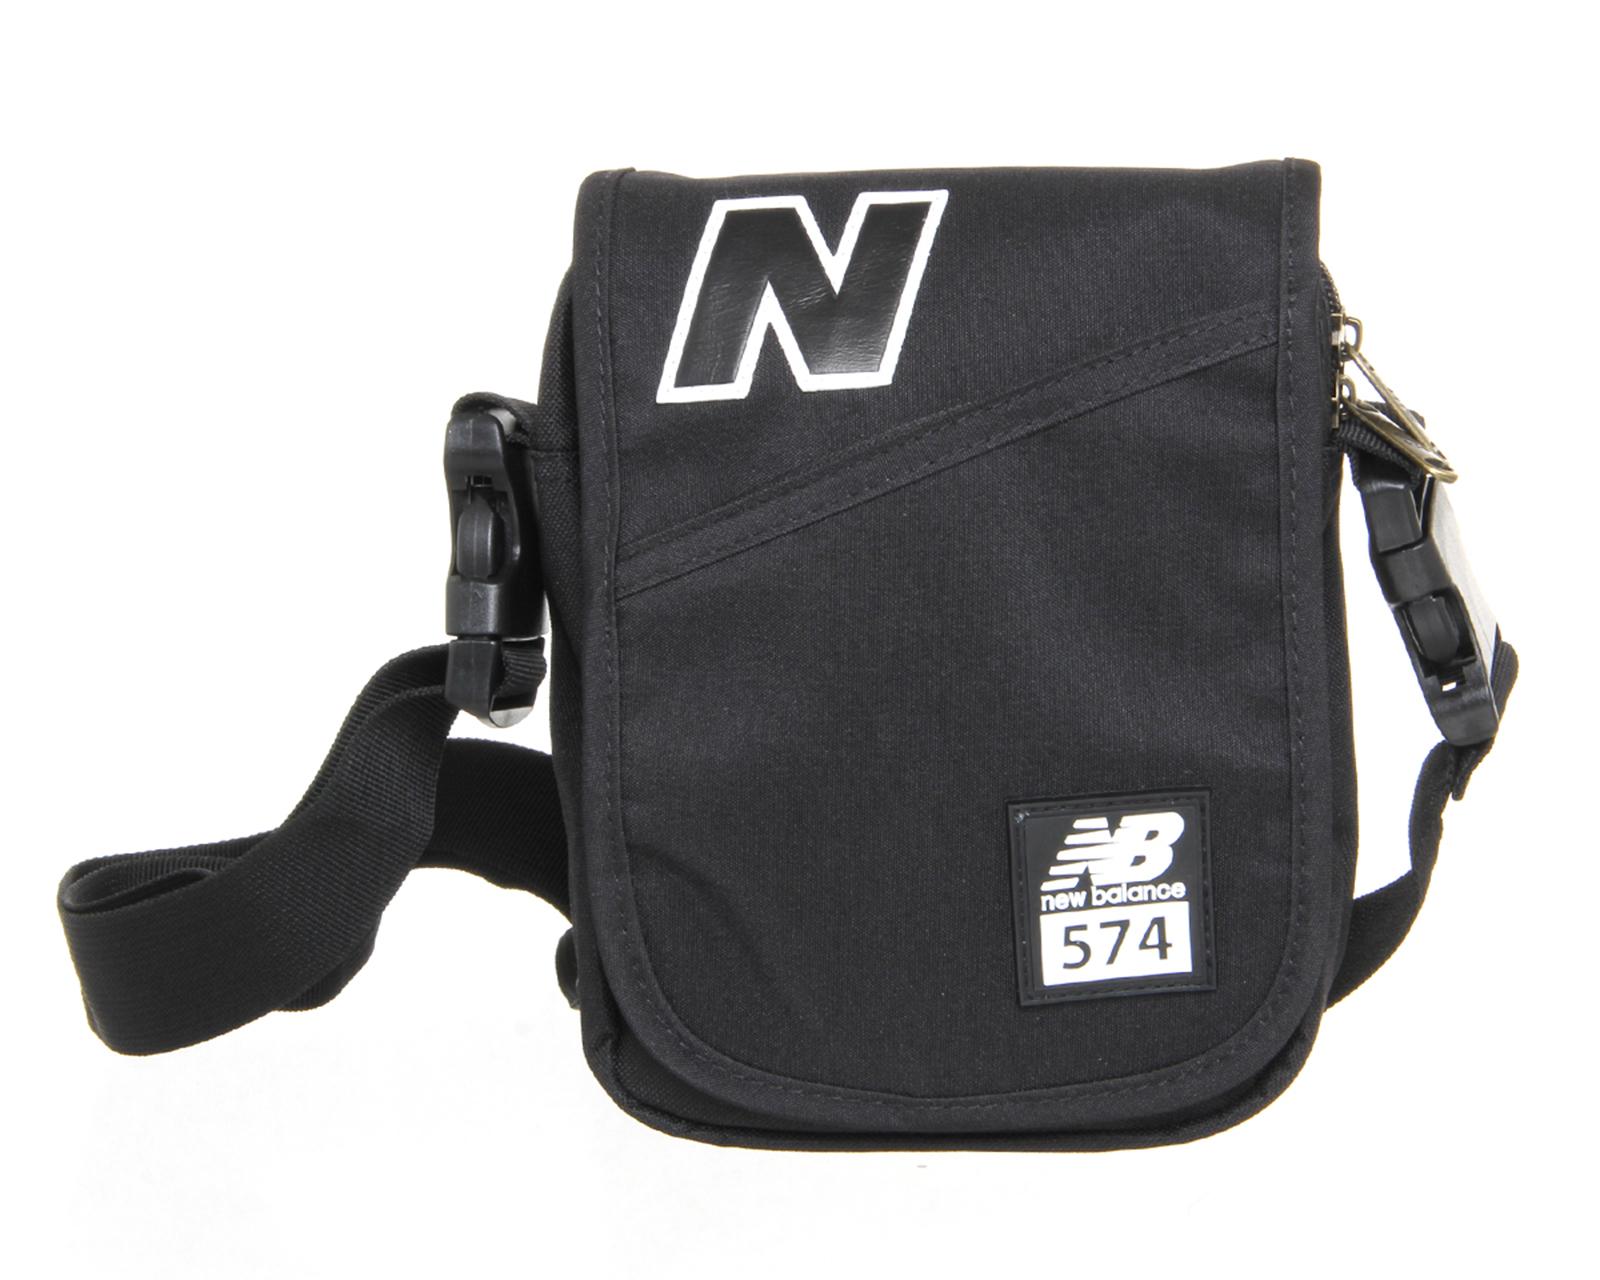 new balance 574 grey suede handbag